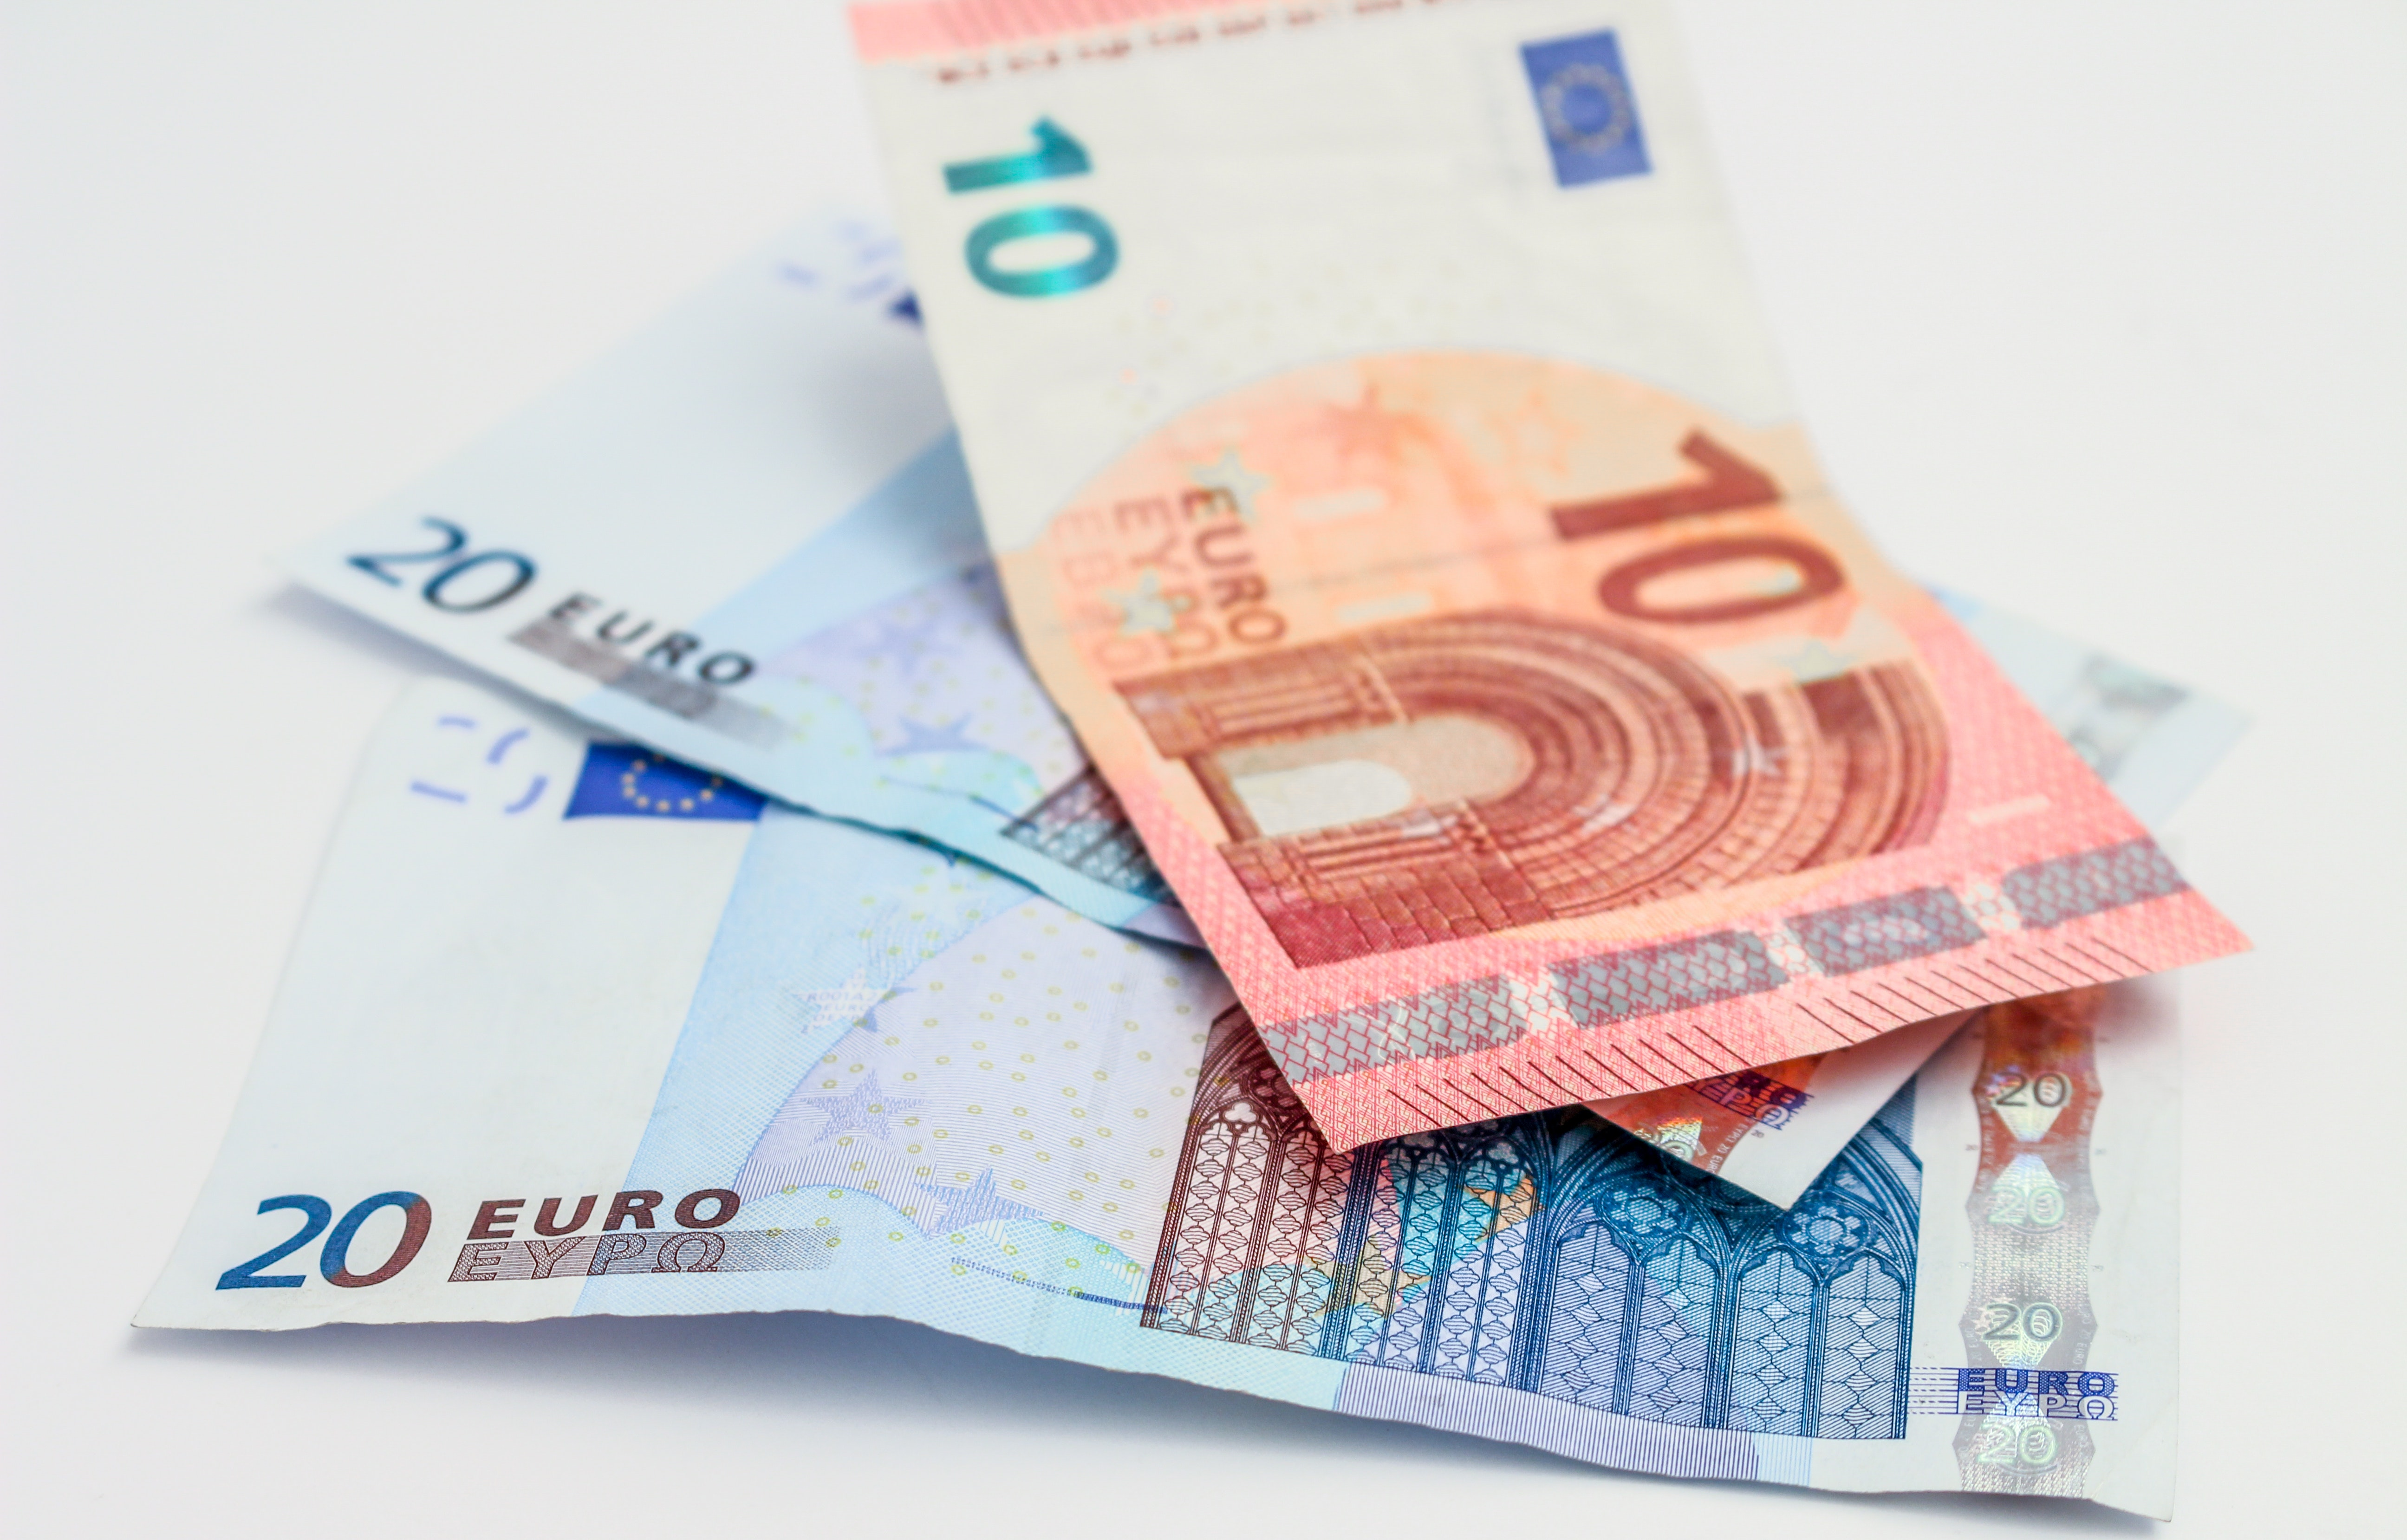 10-euros-20-euros-account-45112